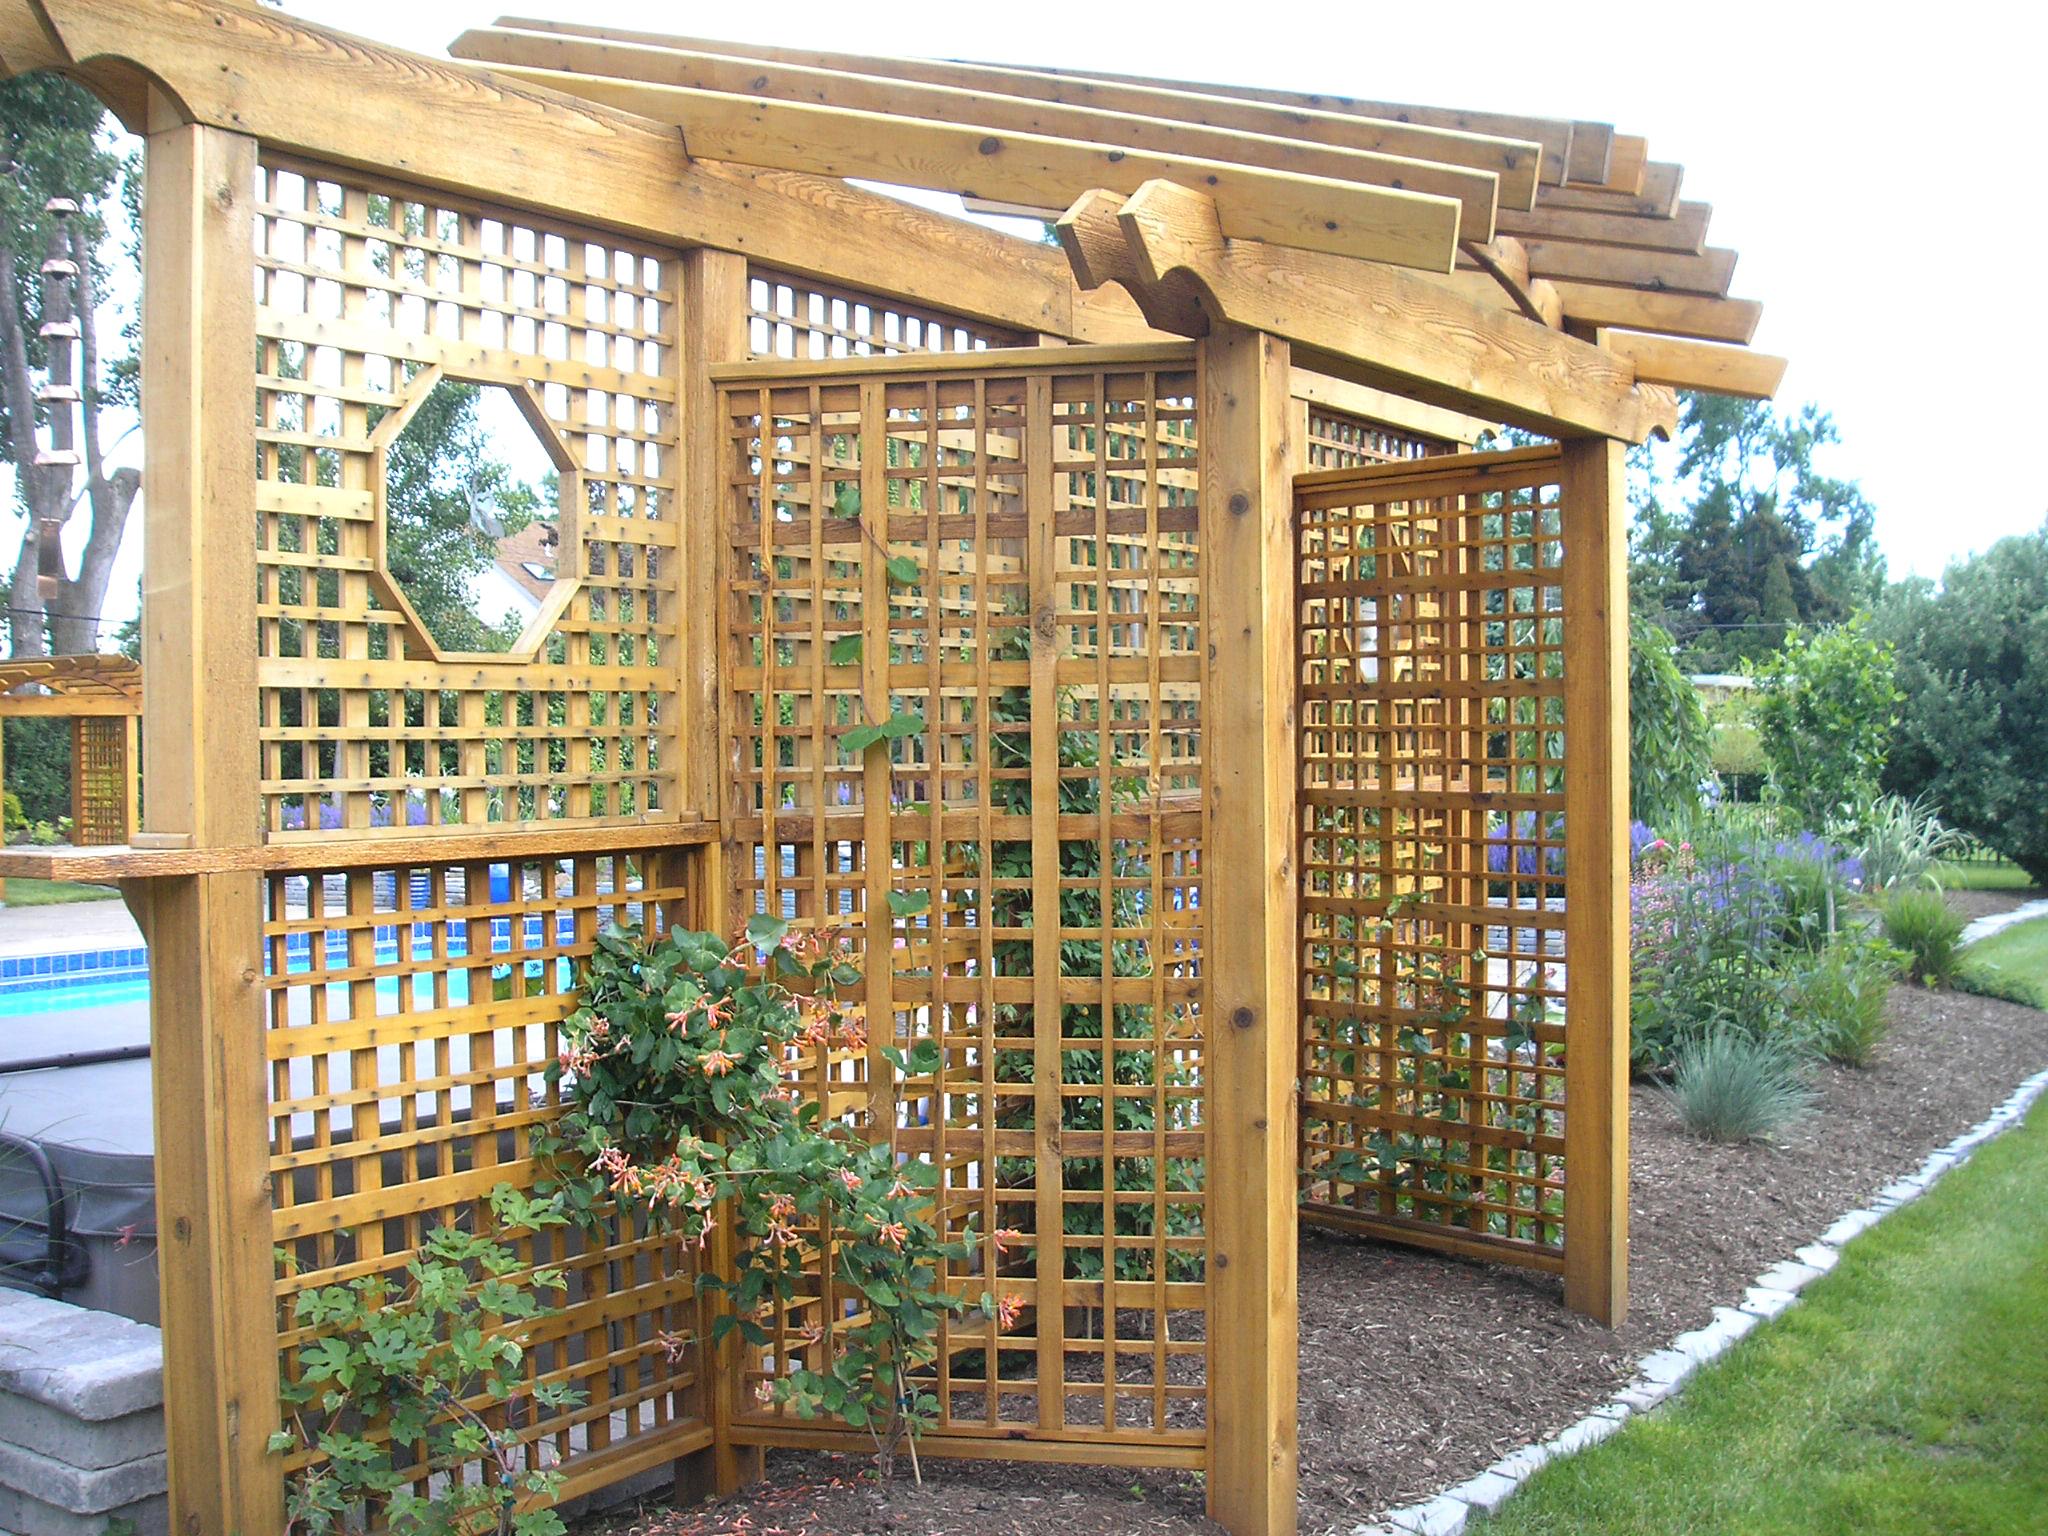 English Gardener Projects | The English Gardener